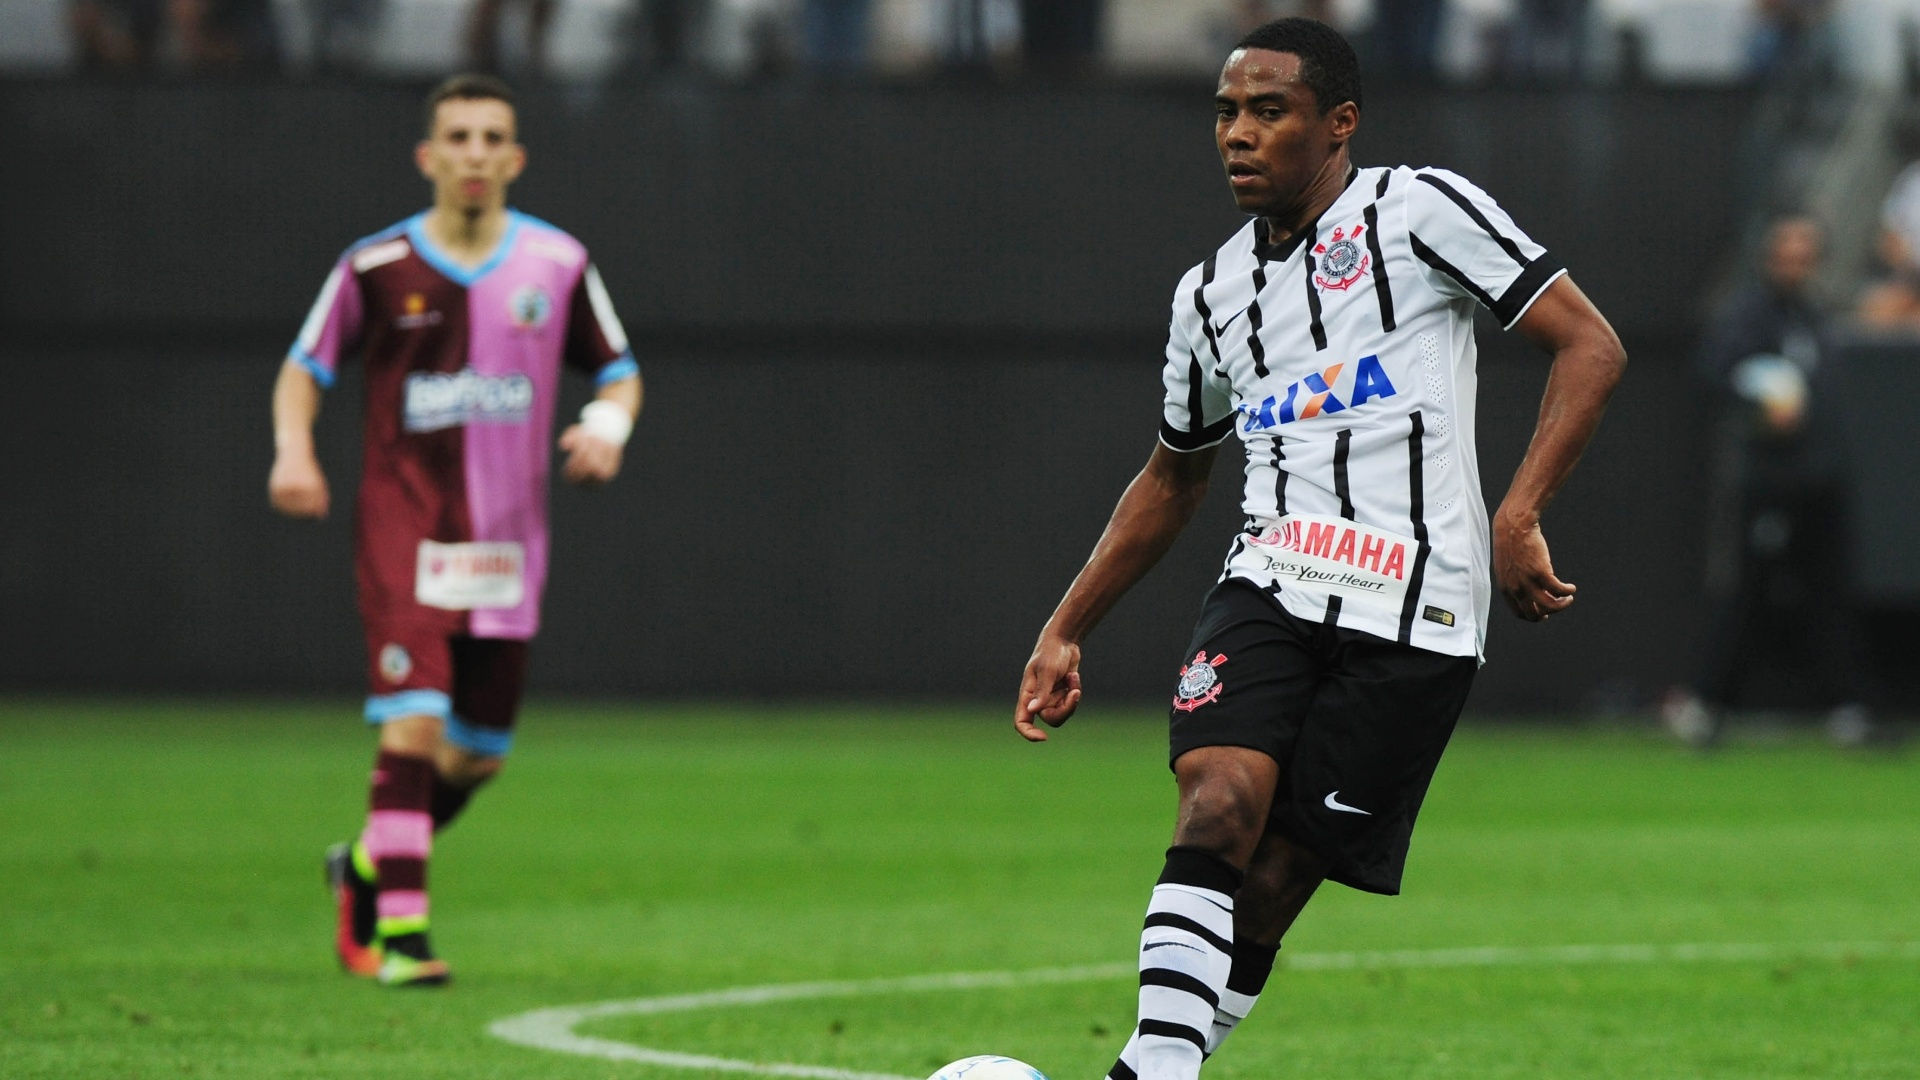 Elias se prepara para fazer o passe durante amistoso entre Corinthians x Corinthians-Casuals